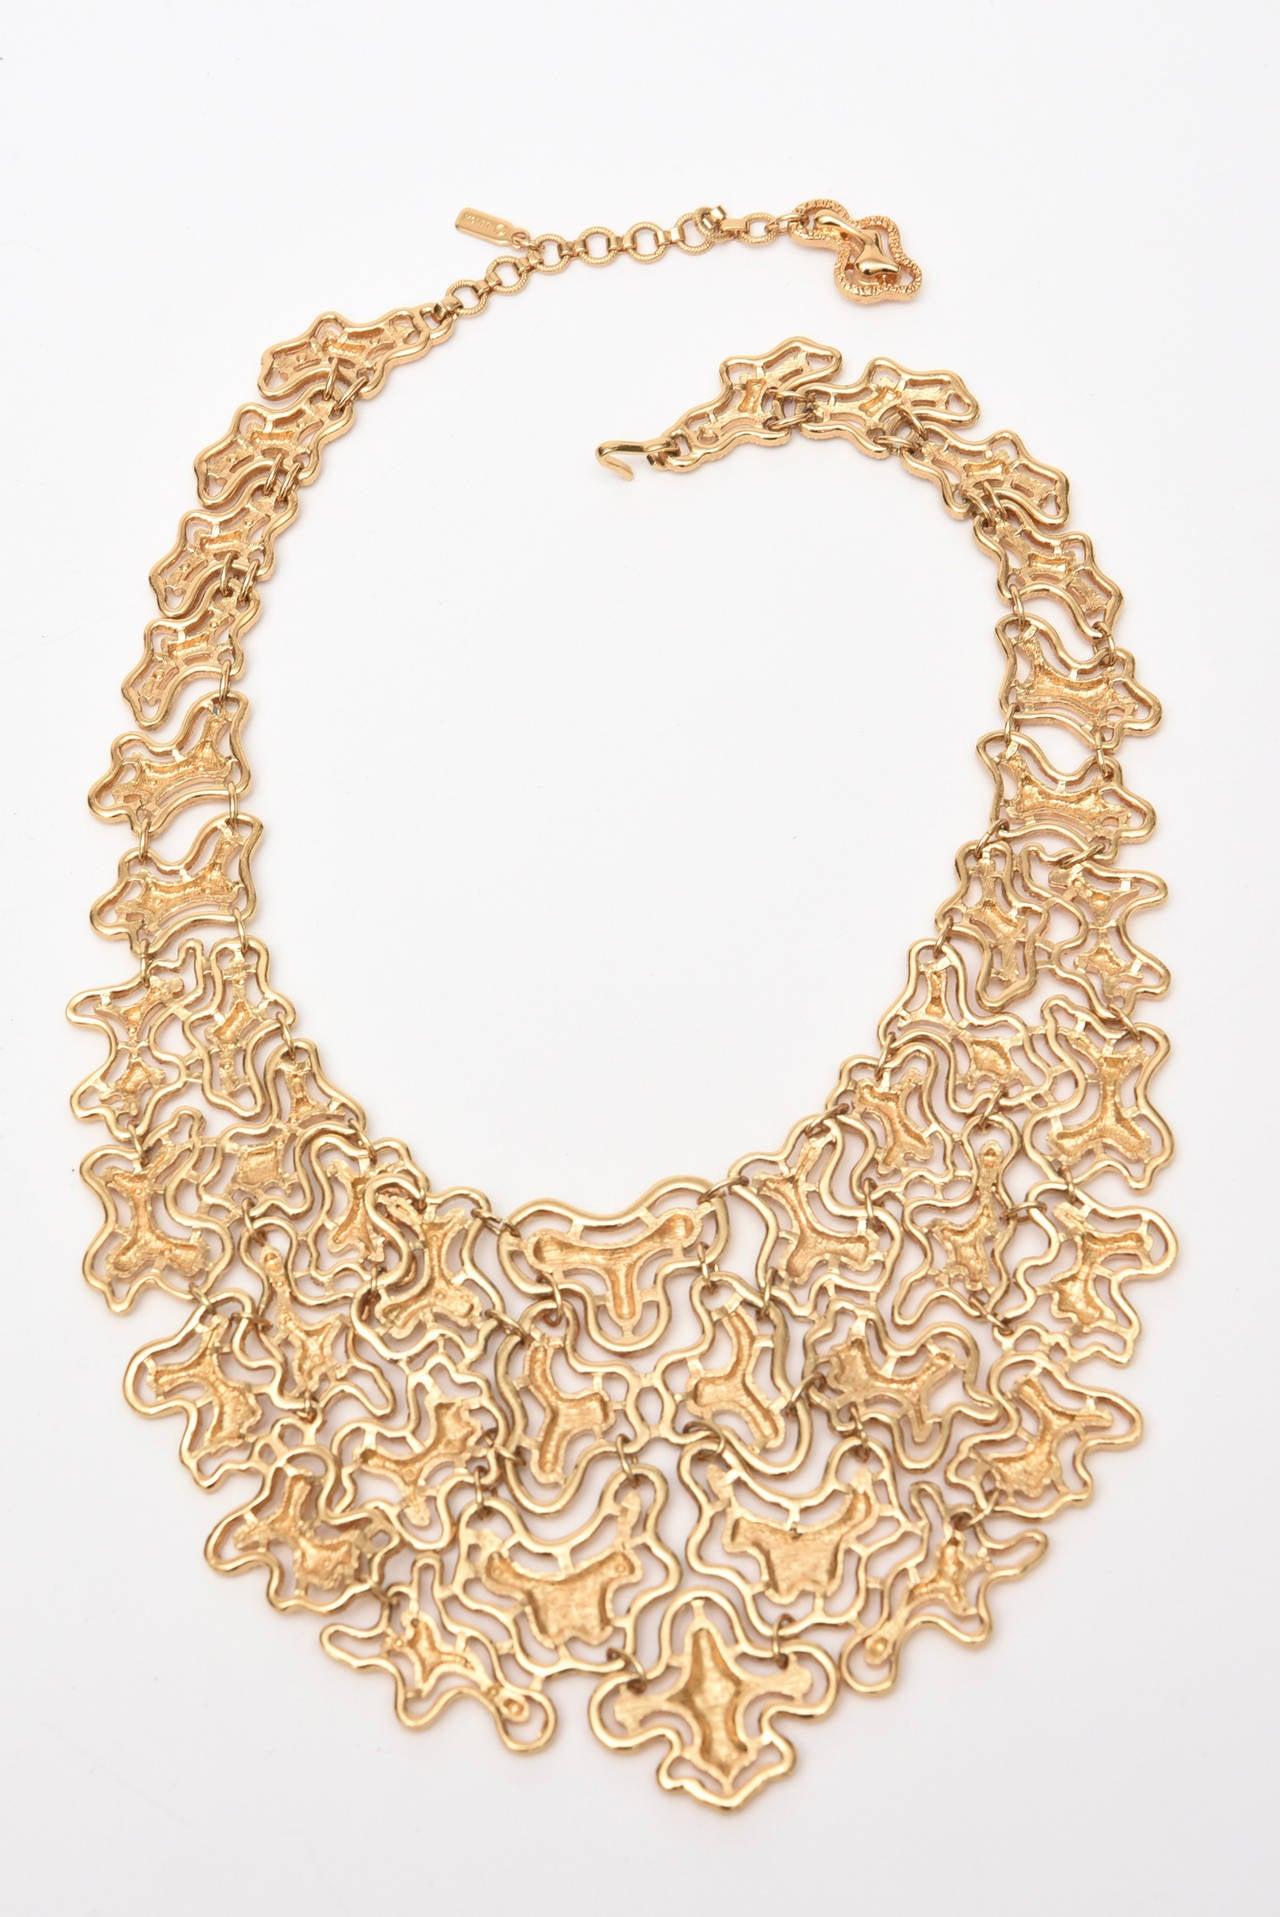 Monet Sculptural Bib Necklace Vintage For Sale 1